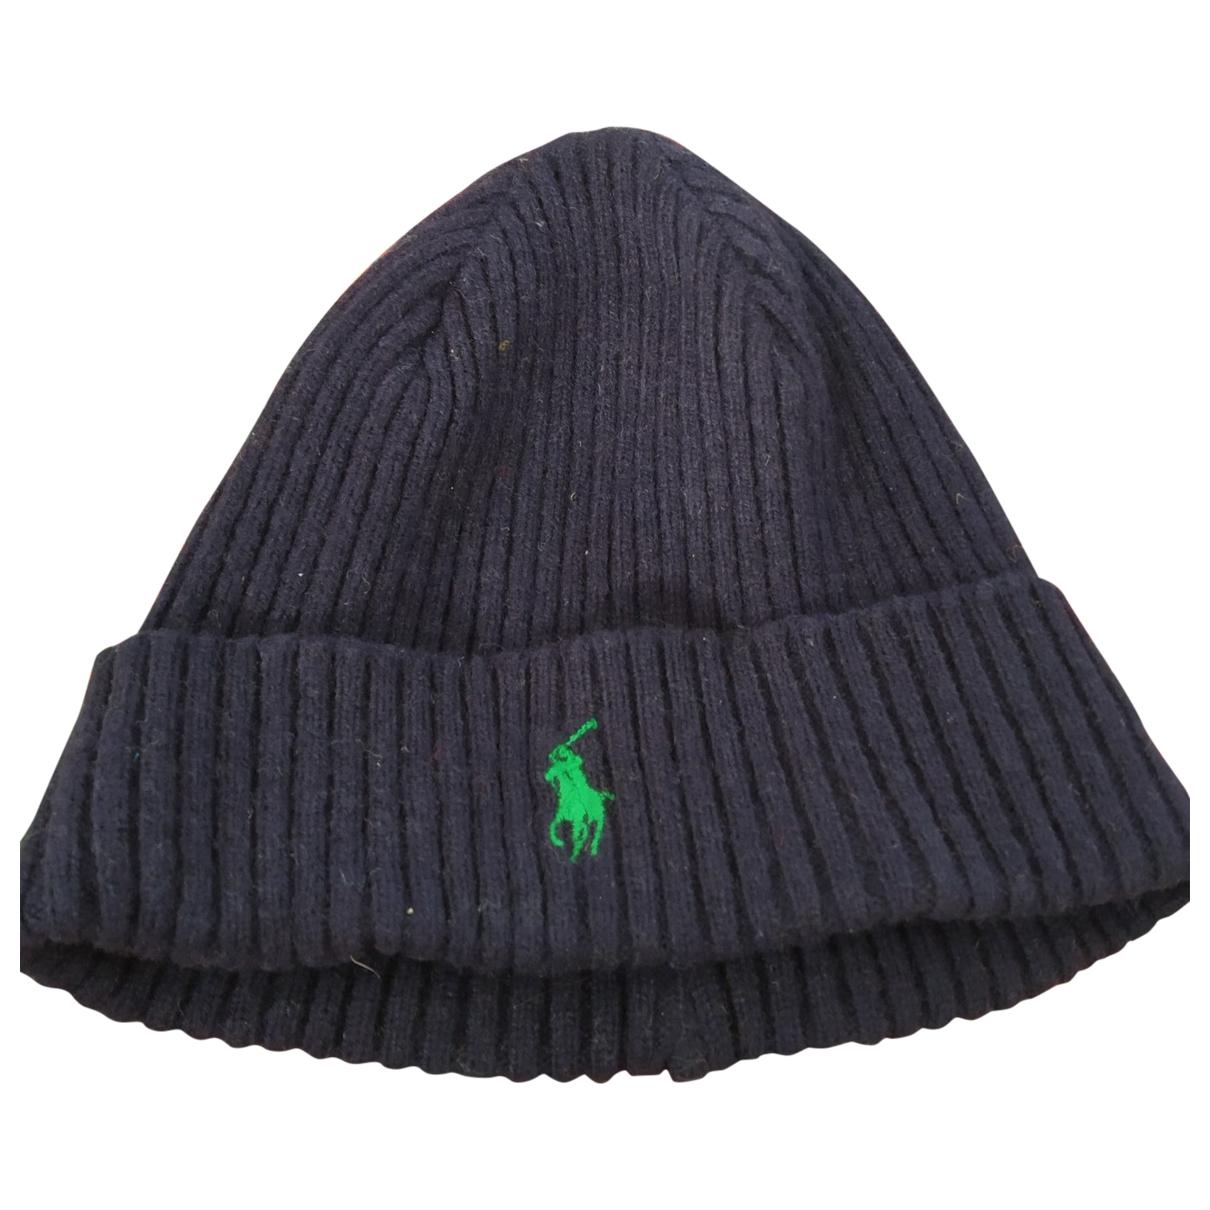 Polo Ralph Lauren \N Hut, Muetzen, Handschuhe in  Blau Wolle